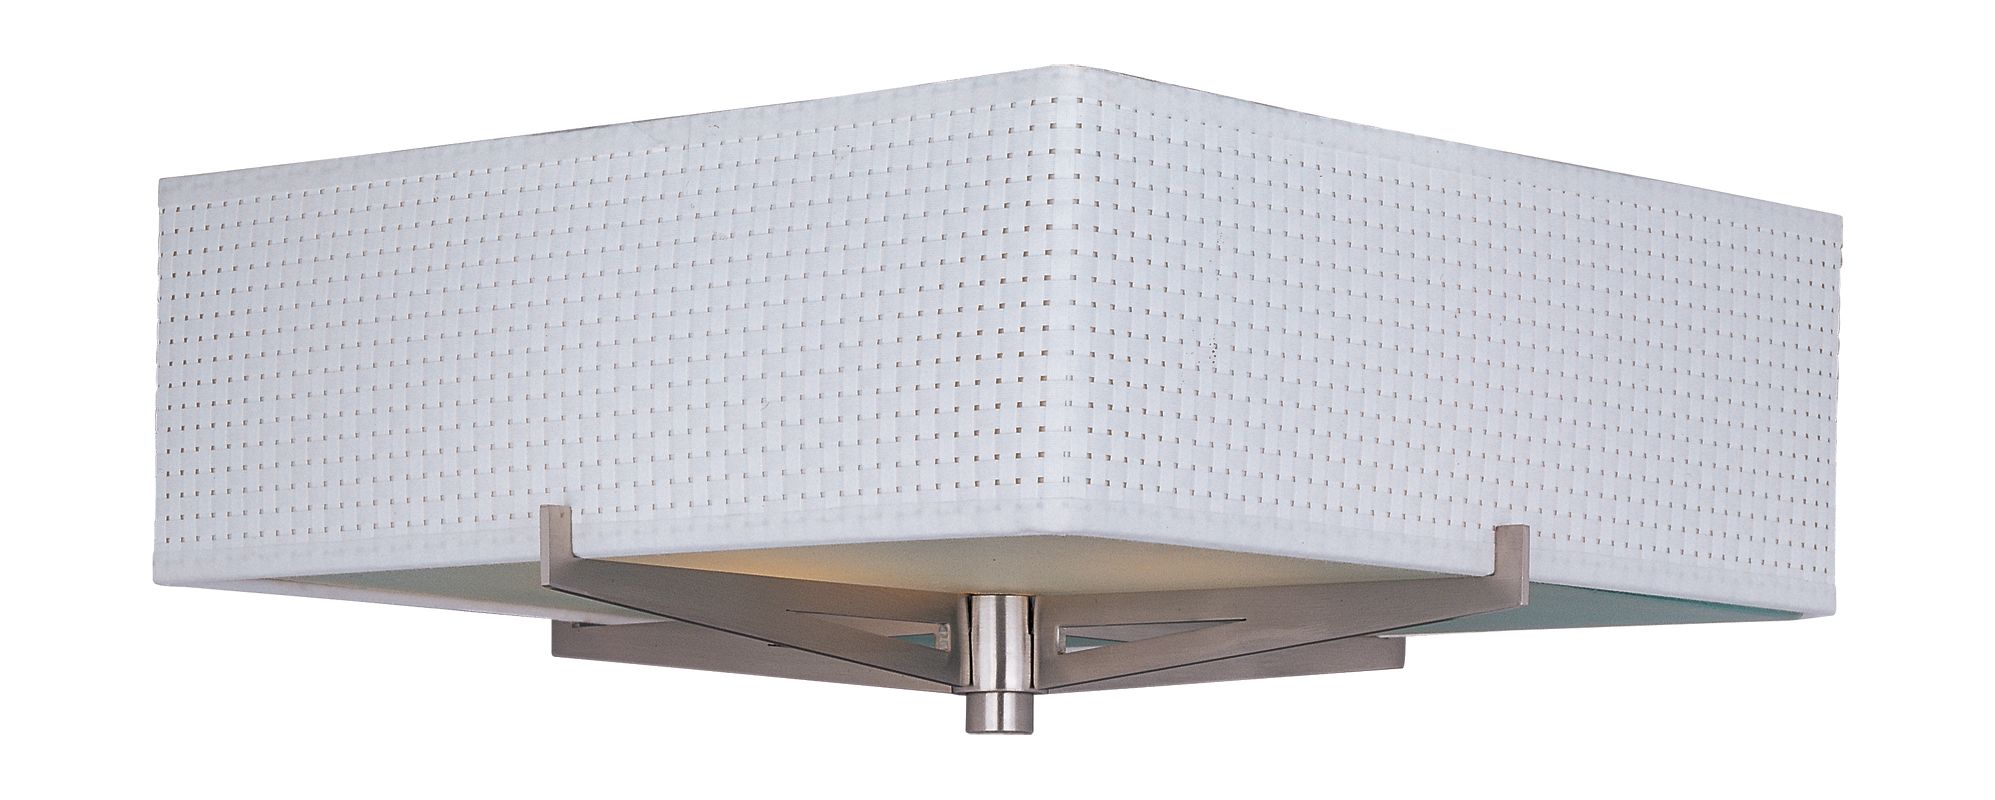 ET2 E95340-100SN Satin Nickel Contemporary Elements Ceiling Light